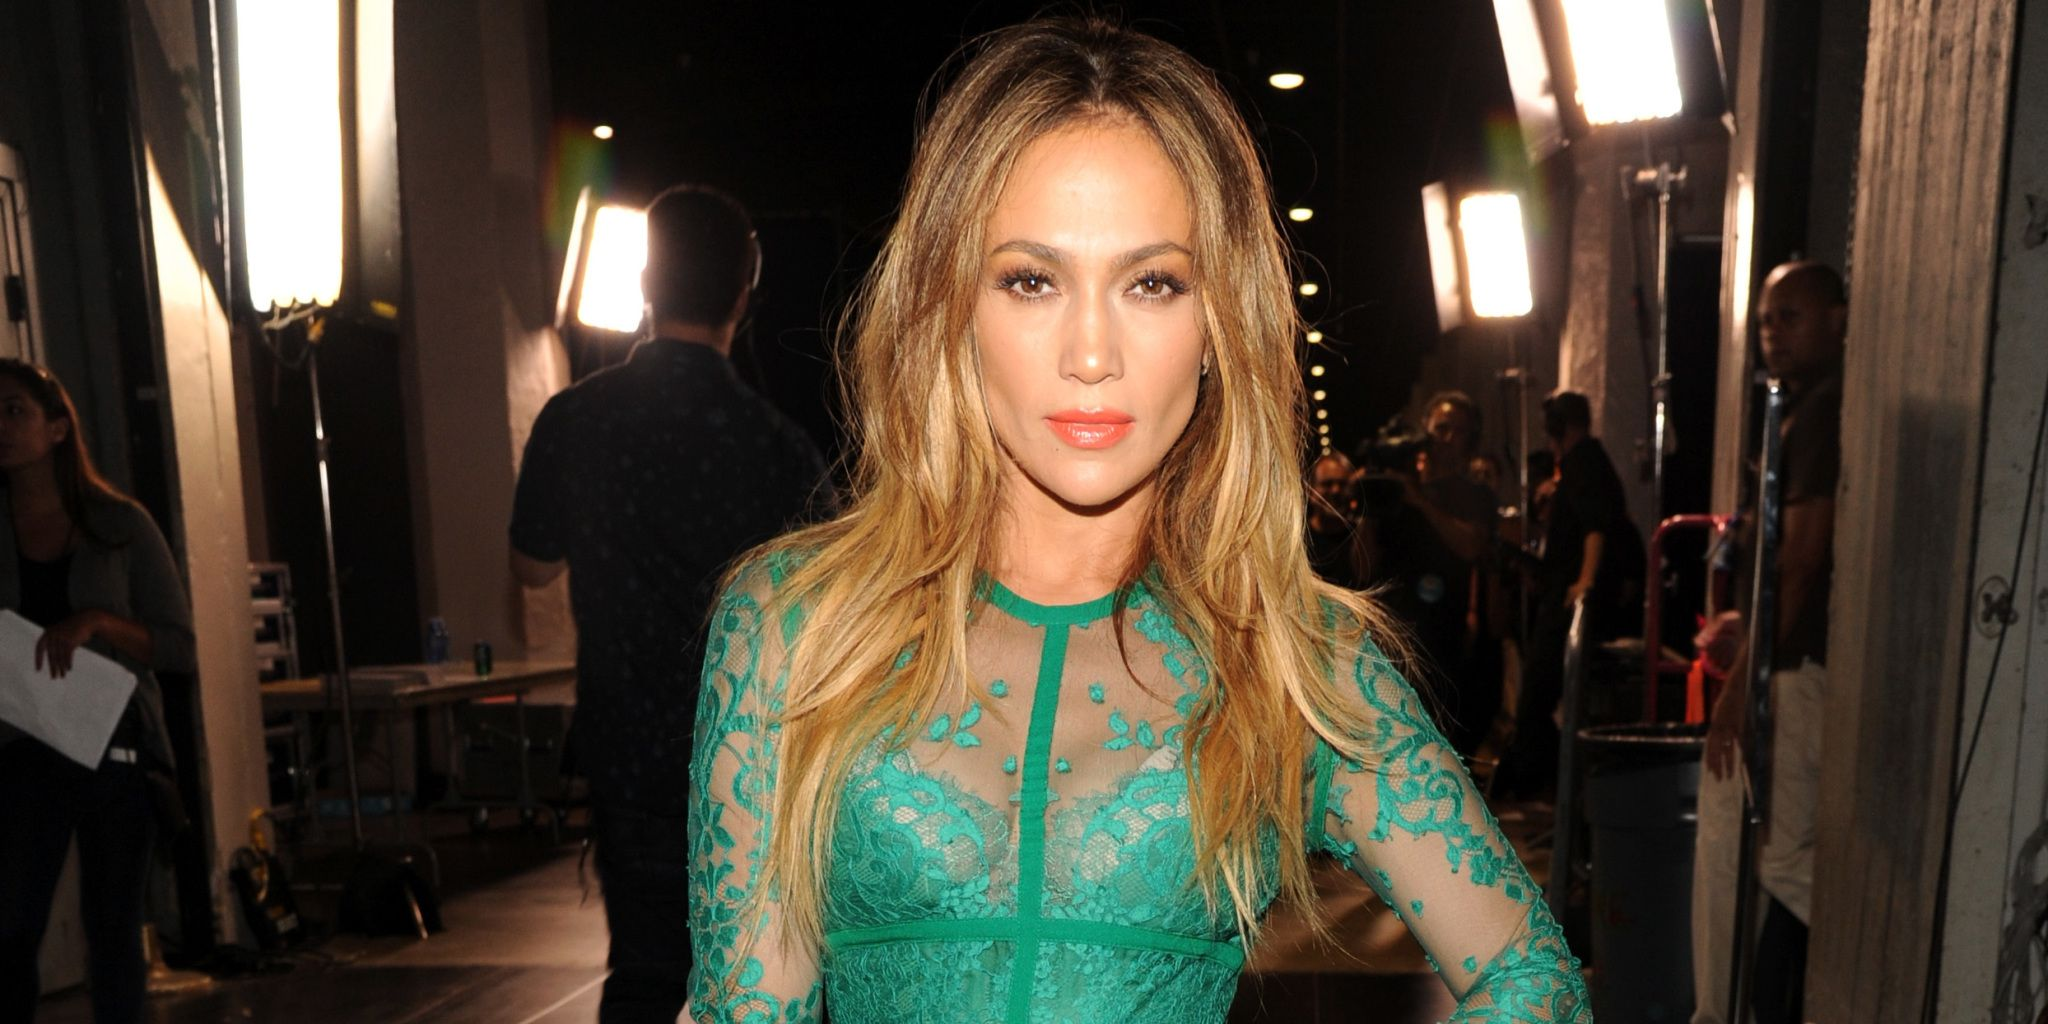 Jennifer Lopez wearing green lace dress at the 2014 Teen Choice Awards - celebrity style photos - fashion - cosmopolitan.co.uk -Cosmopolitan.co.uk